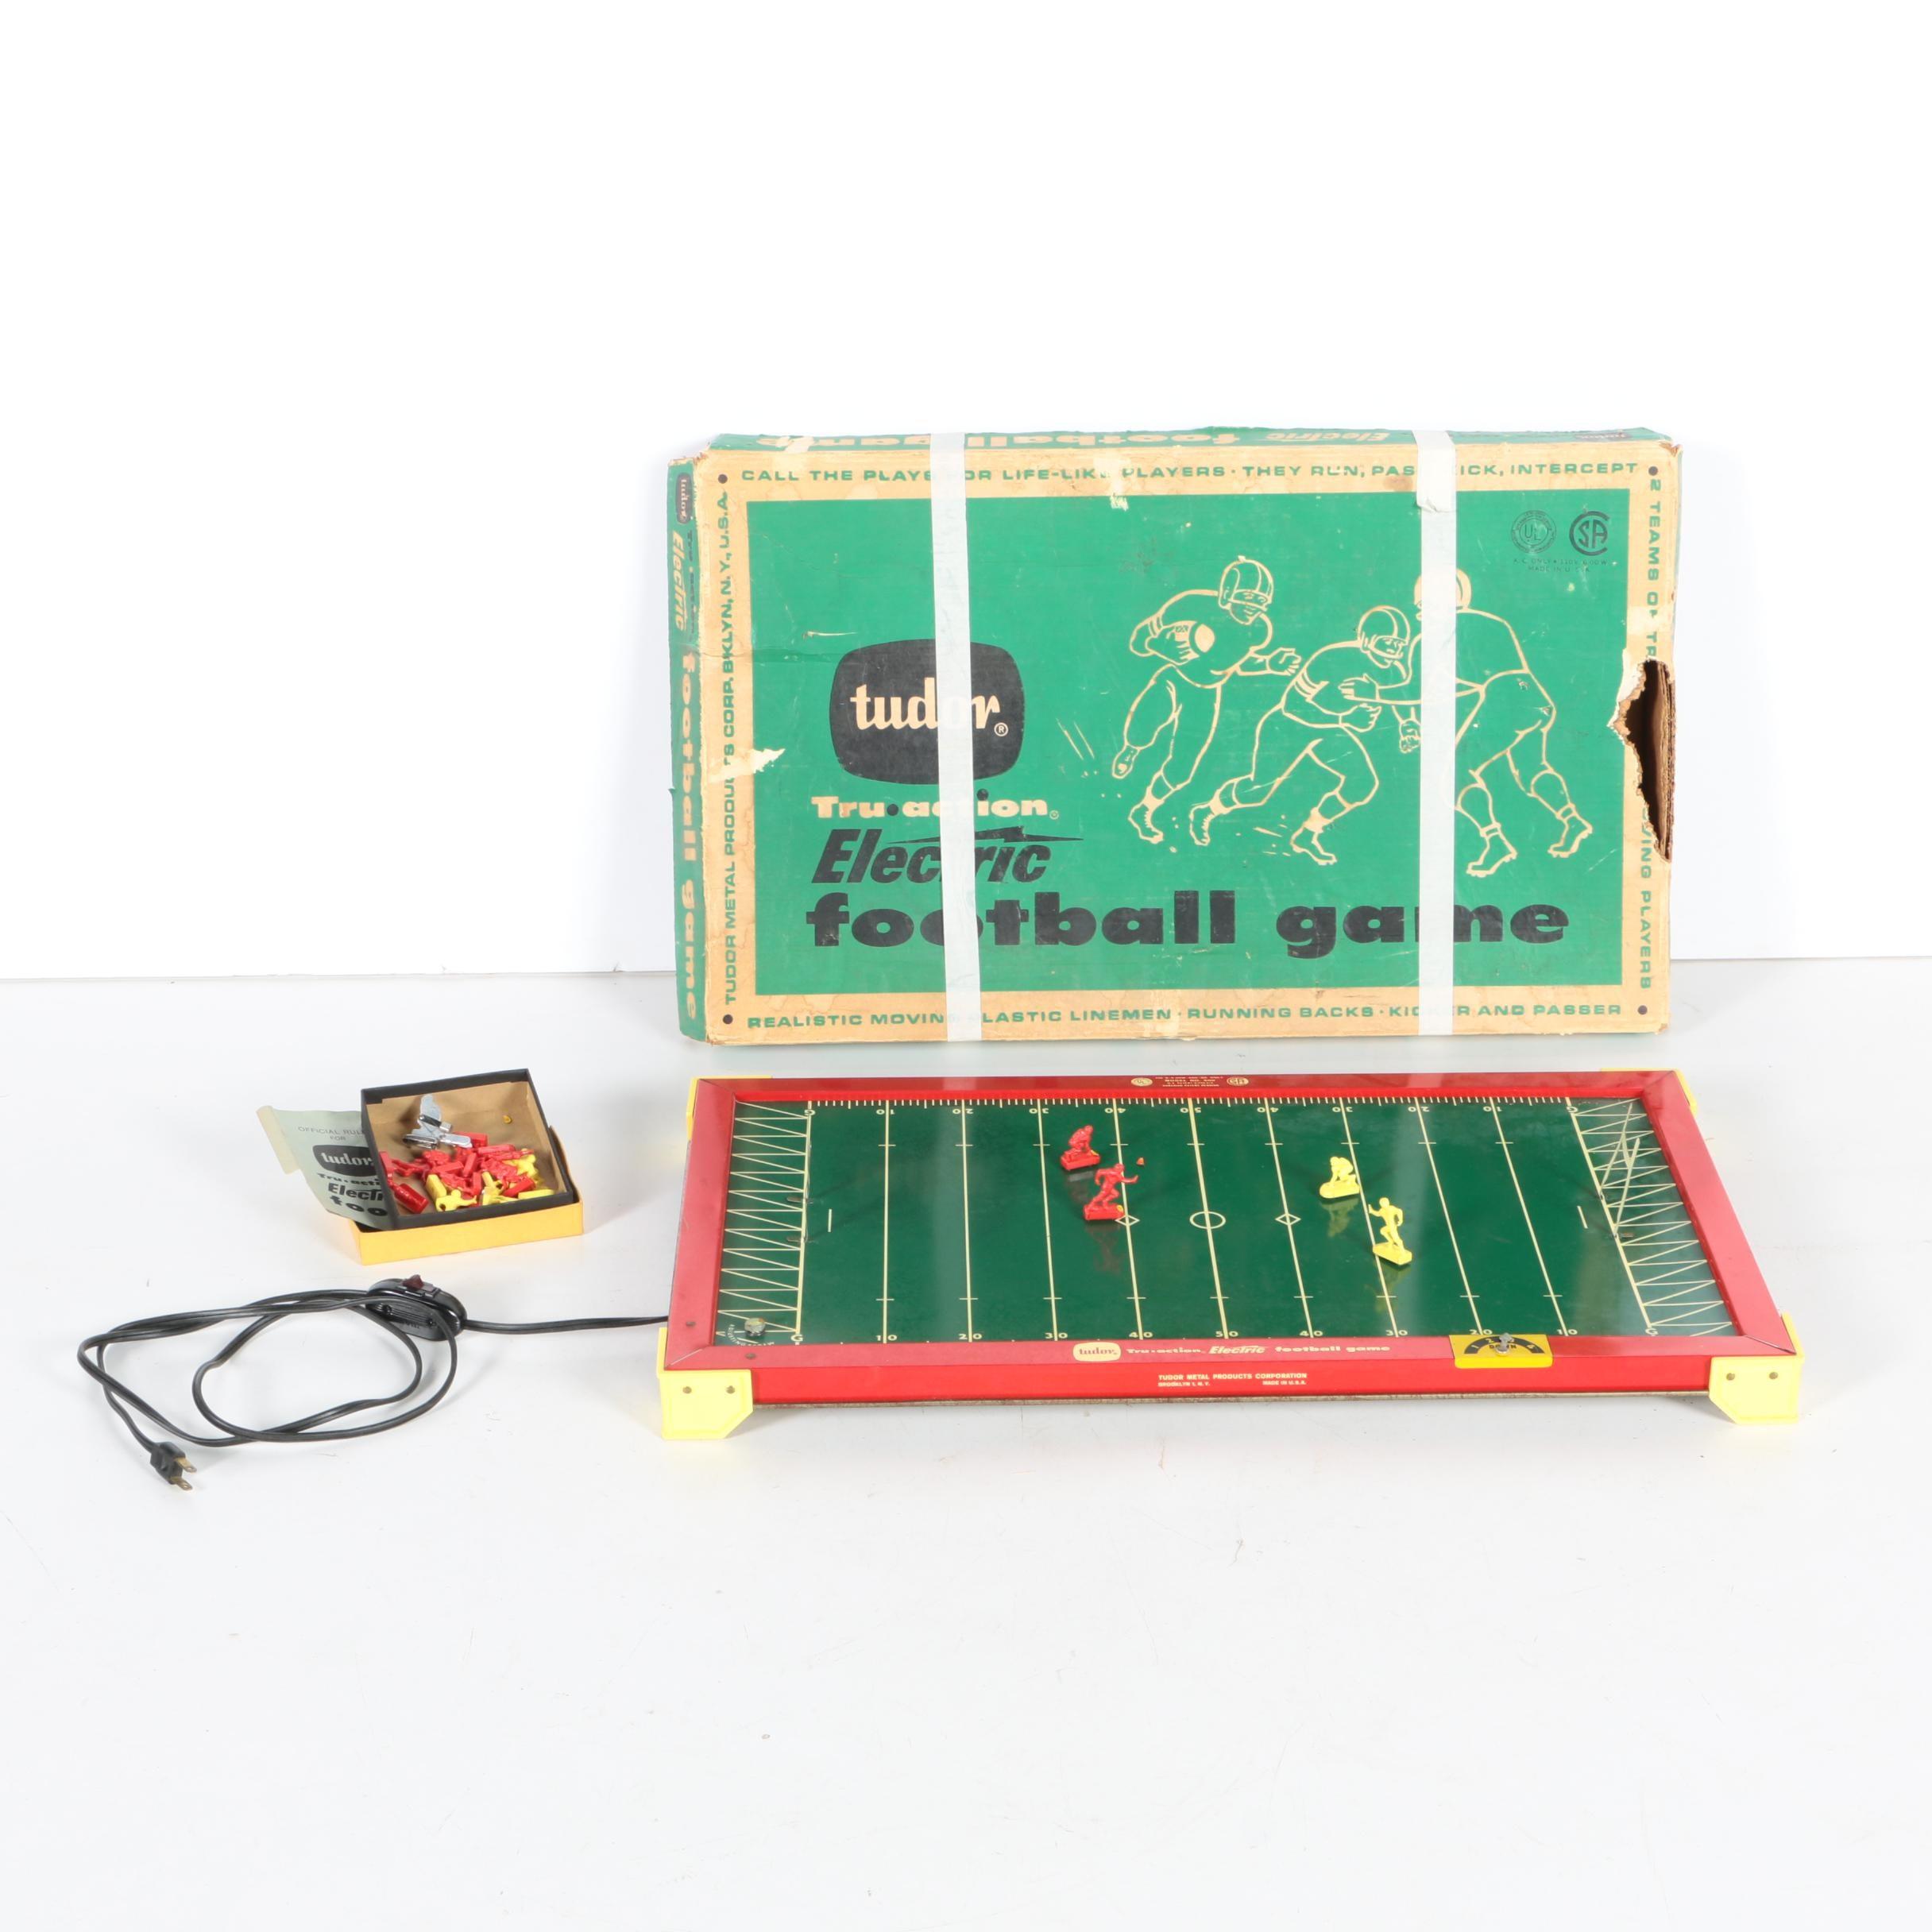 1950s-Era Tudor Tru-Action Electric Football Game